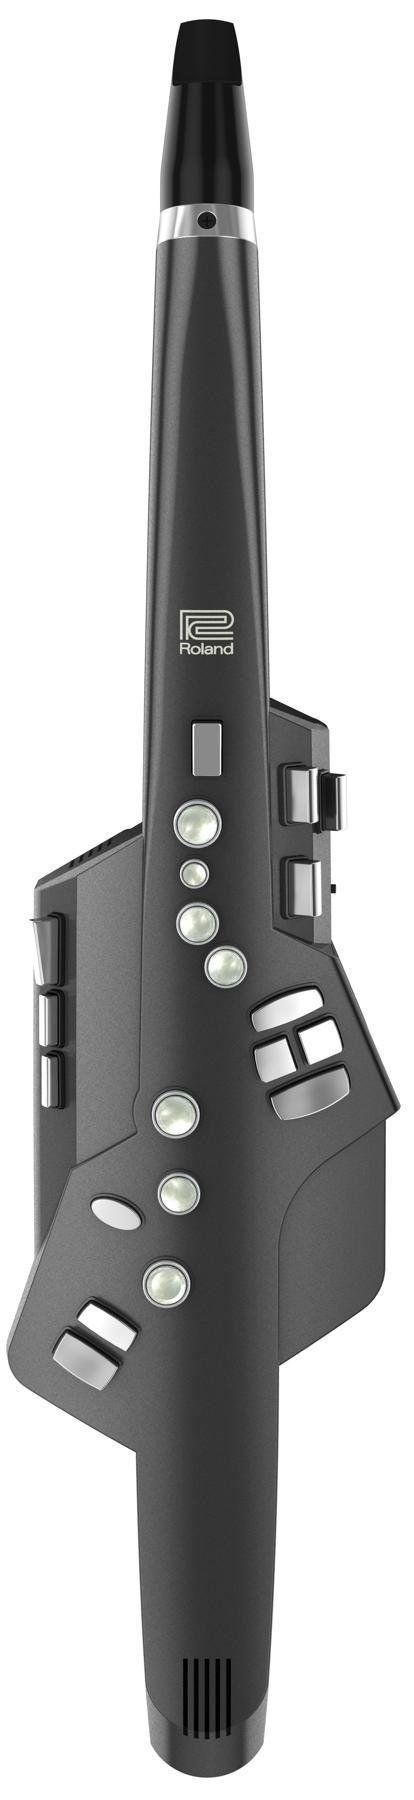 SAXOFONE MIDI ROLAND AEROPHONE AE-10G